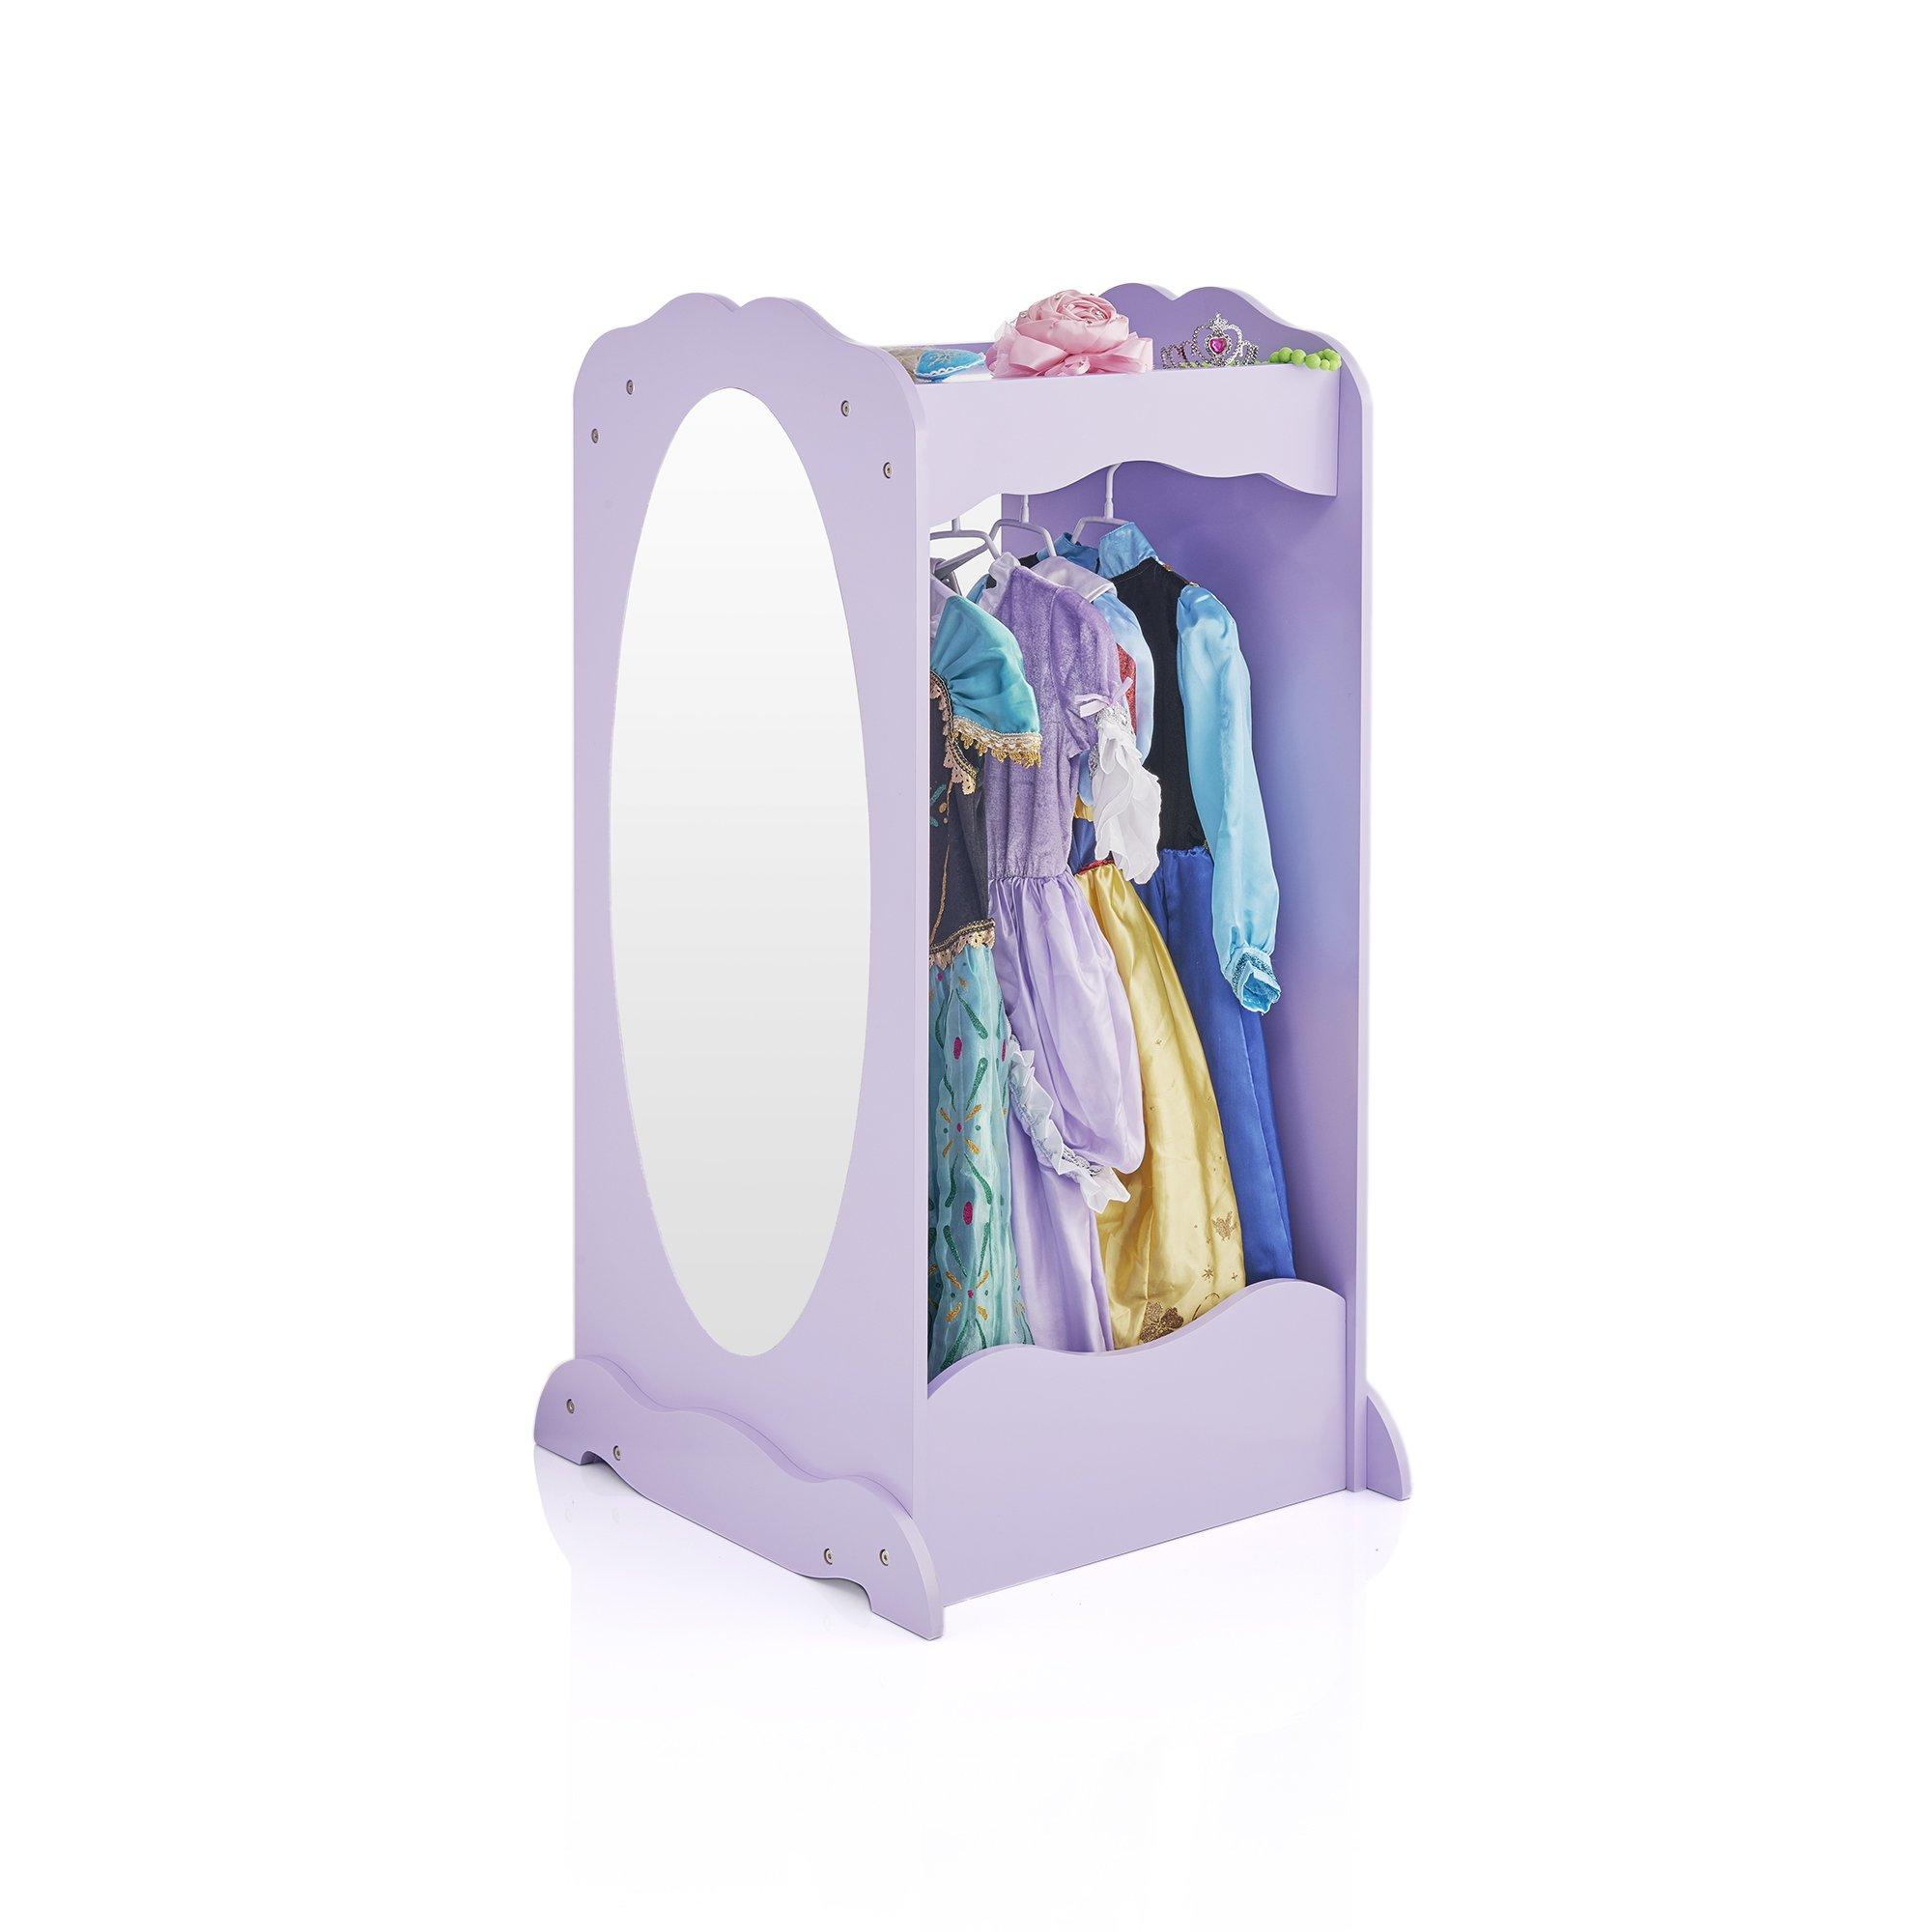 Guidecraft Dress Up Cubby Center Lavender - Armoire, Dresser Kids' Furniture